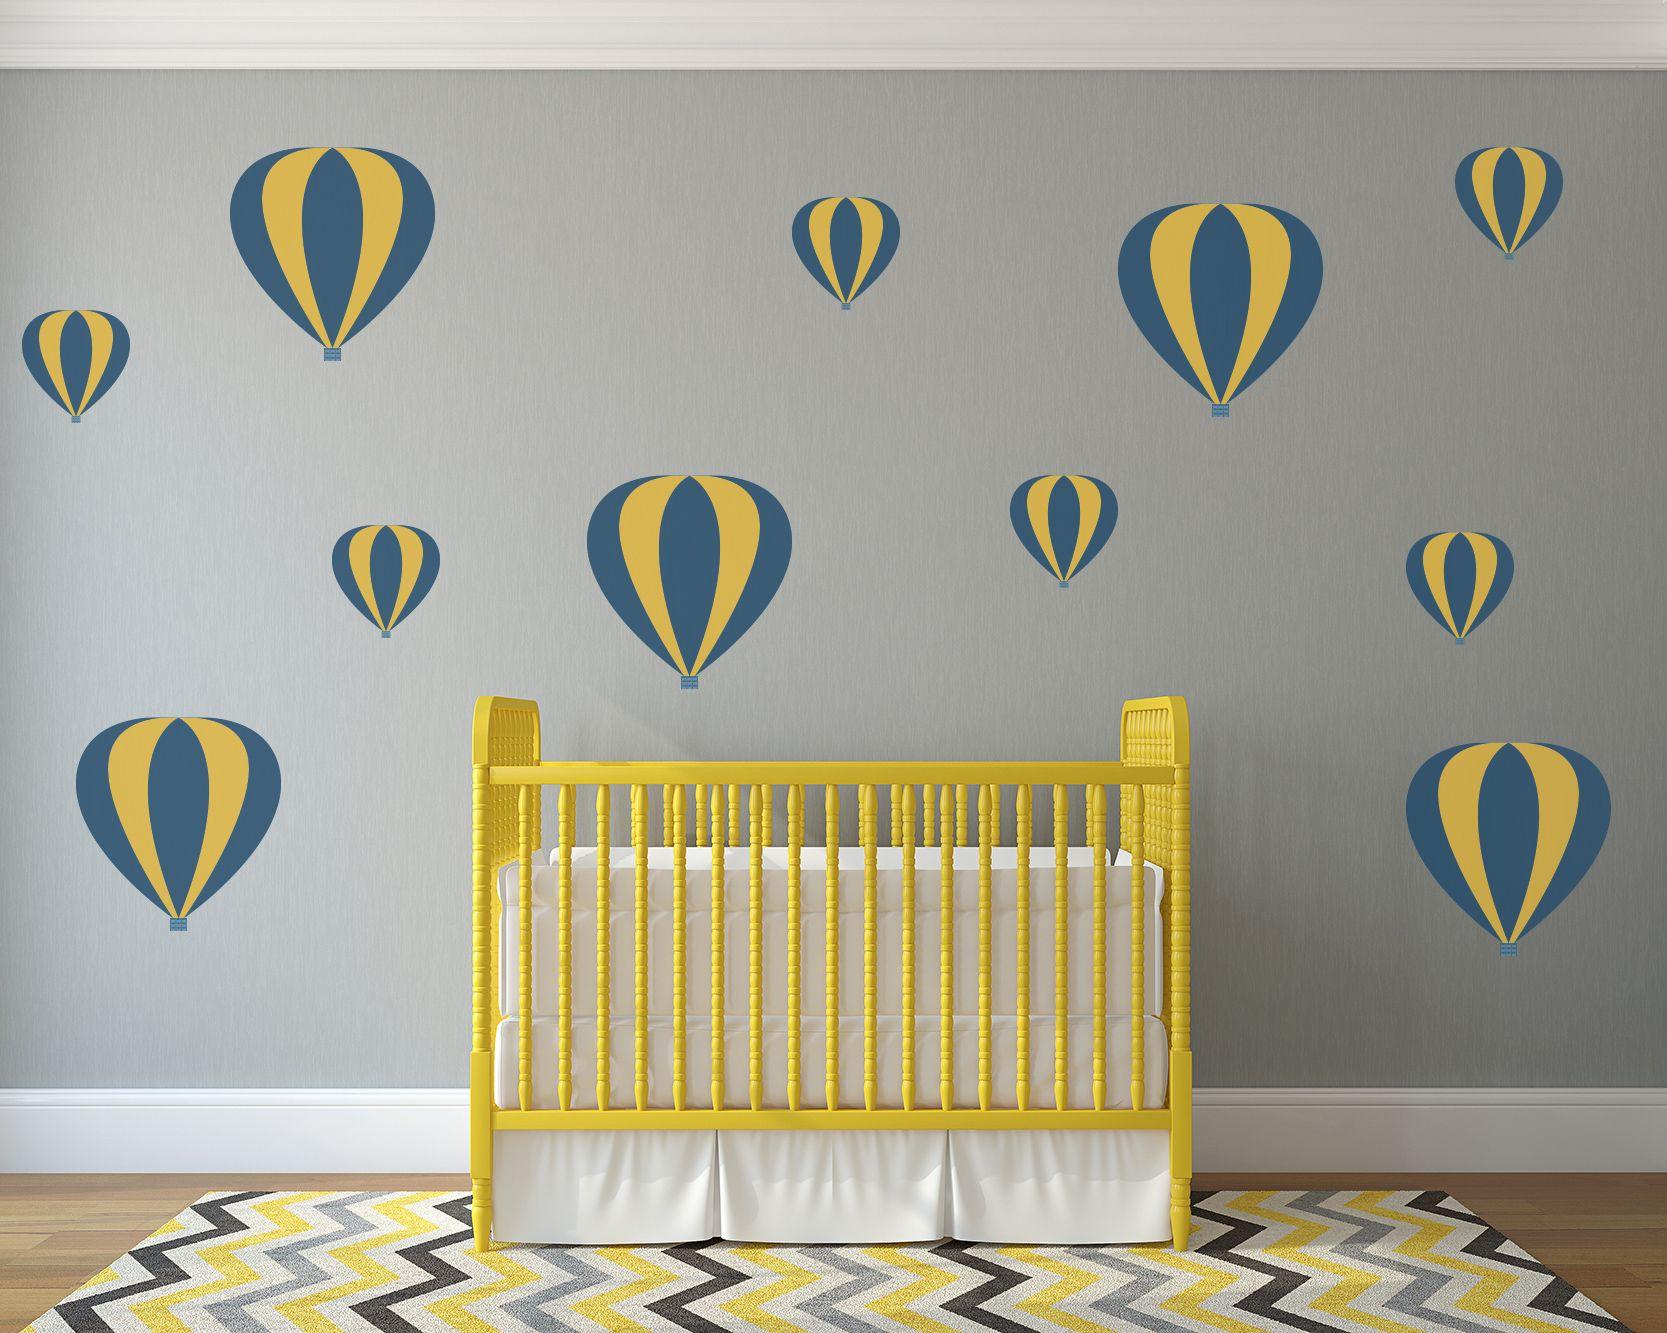 Striped Hot Air Balloons Nursery Wall Art - Vinyl Wall Decals For ...